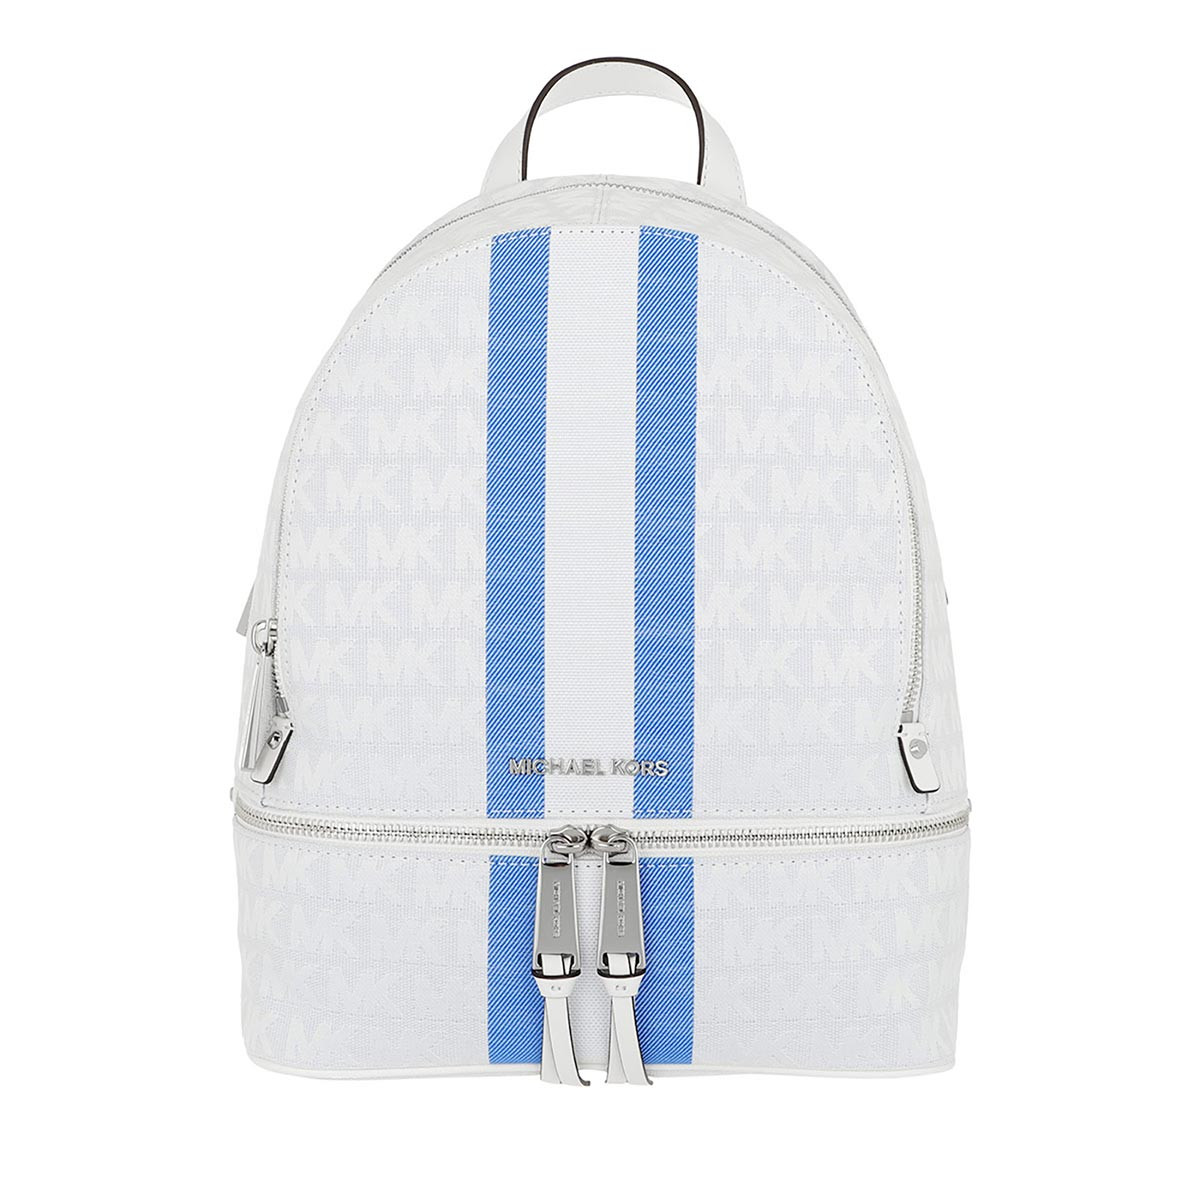 Michael Kors Rucksack - Rhea Zip Medium Backpack Grecin Blue Multi - in weiß - für Damen